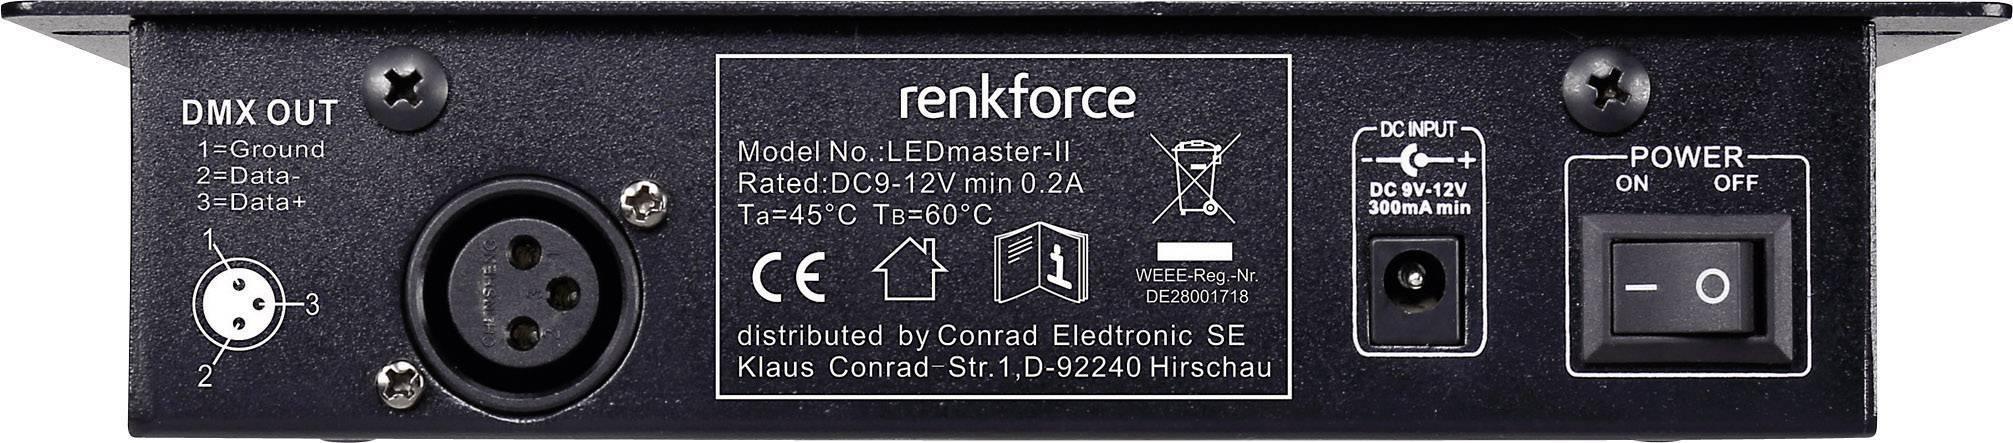 DMX kontrolér Renkforce LEDmaster-II 6-kanálový